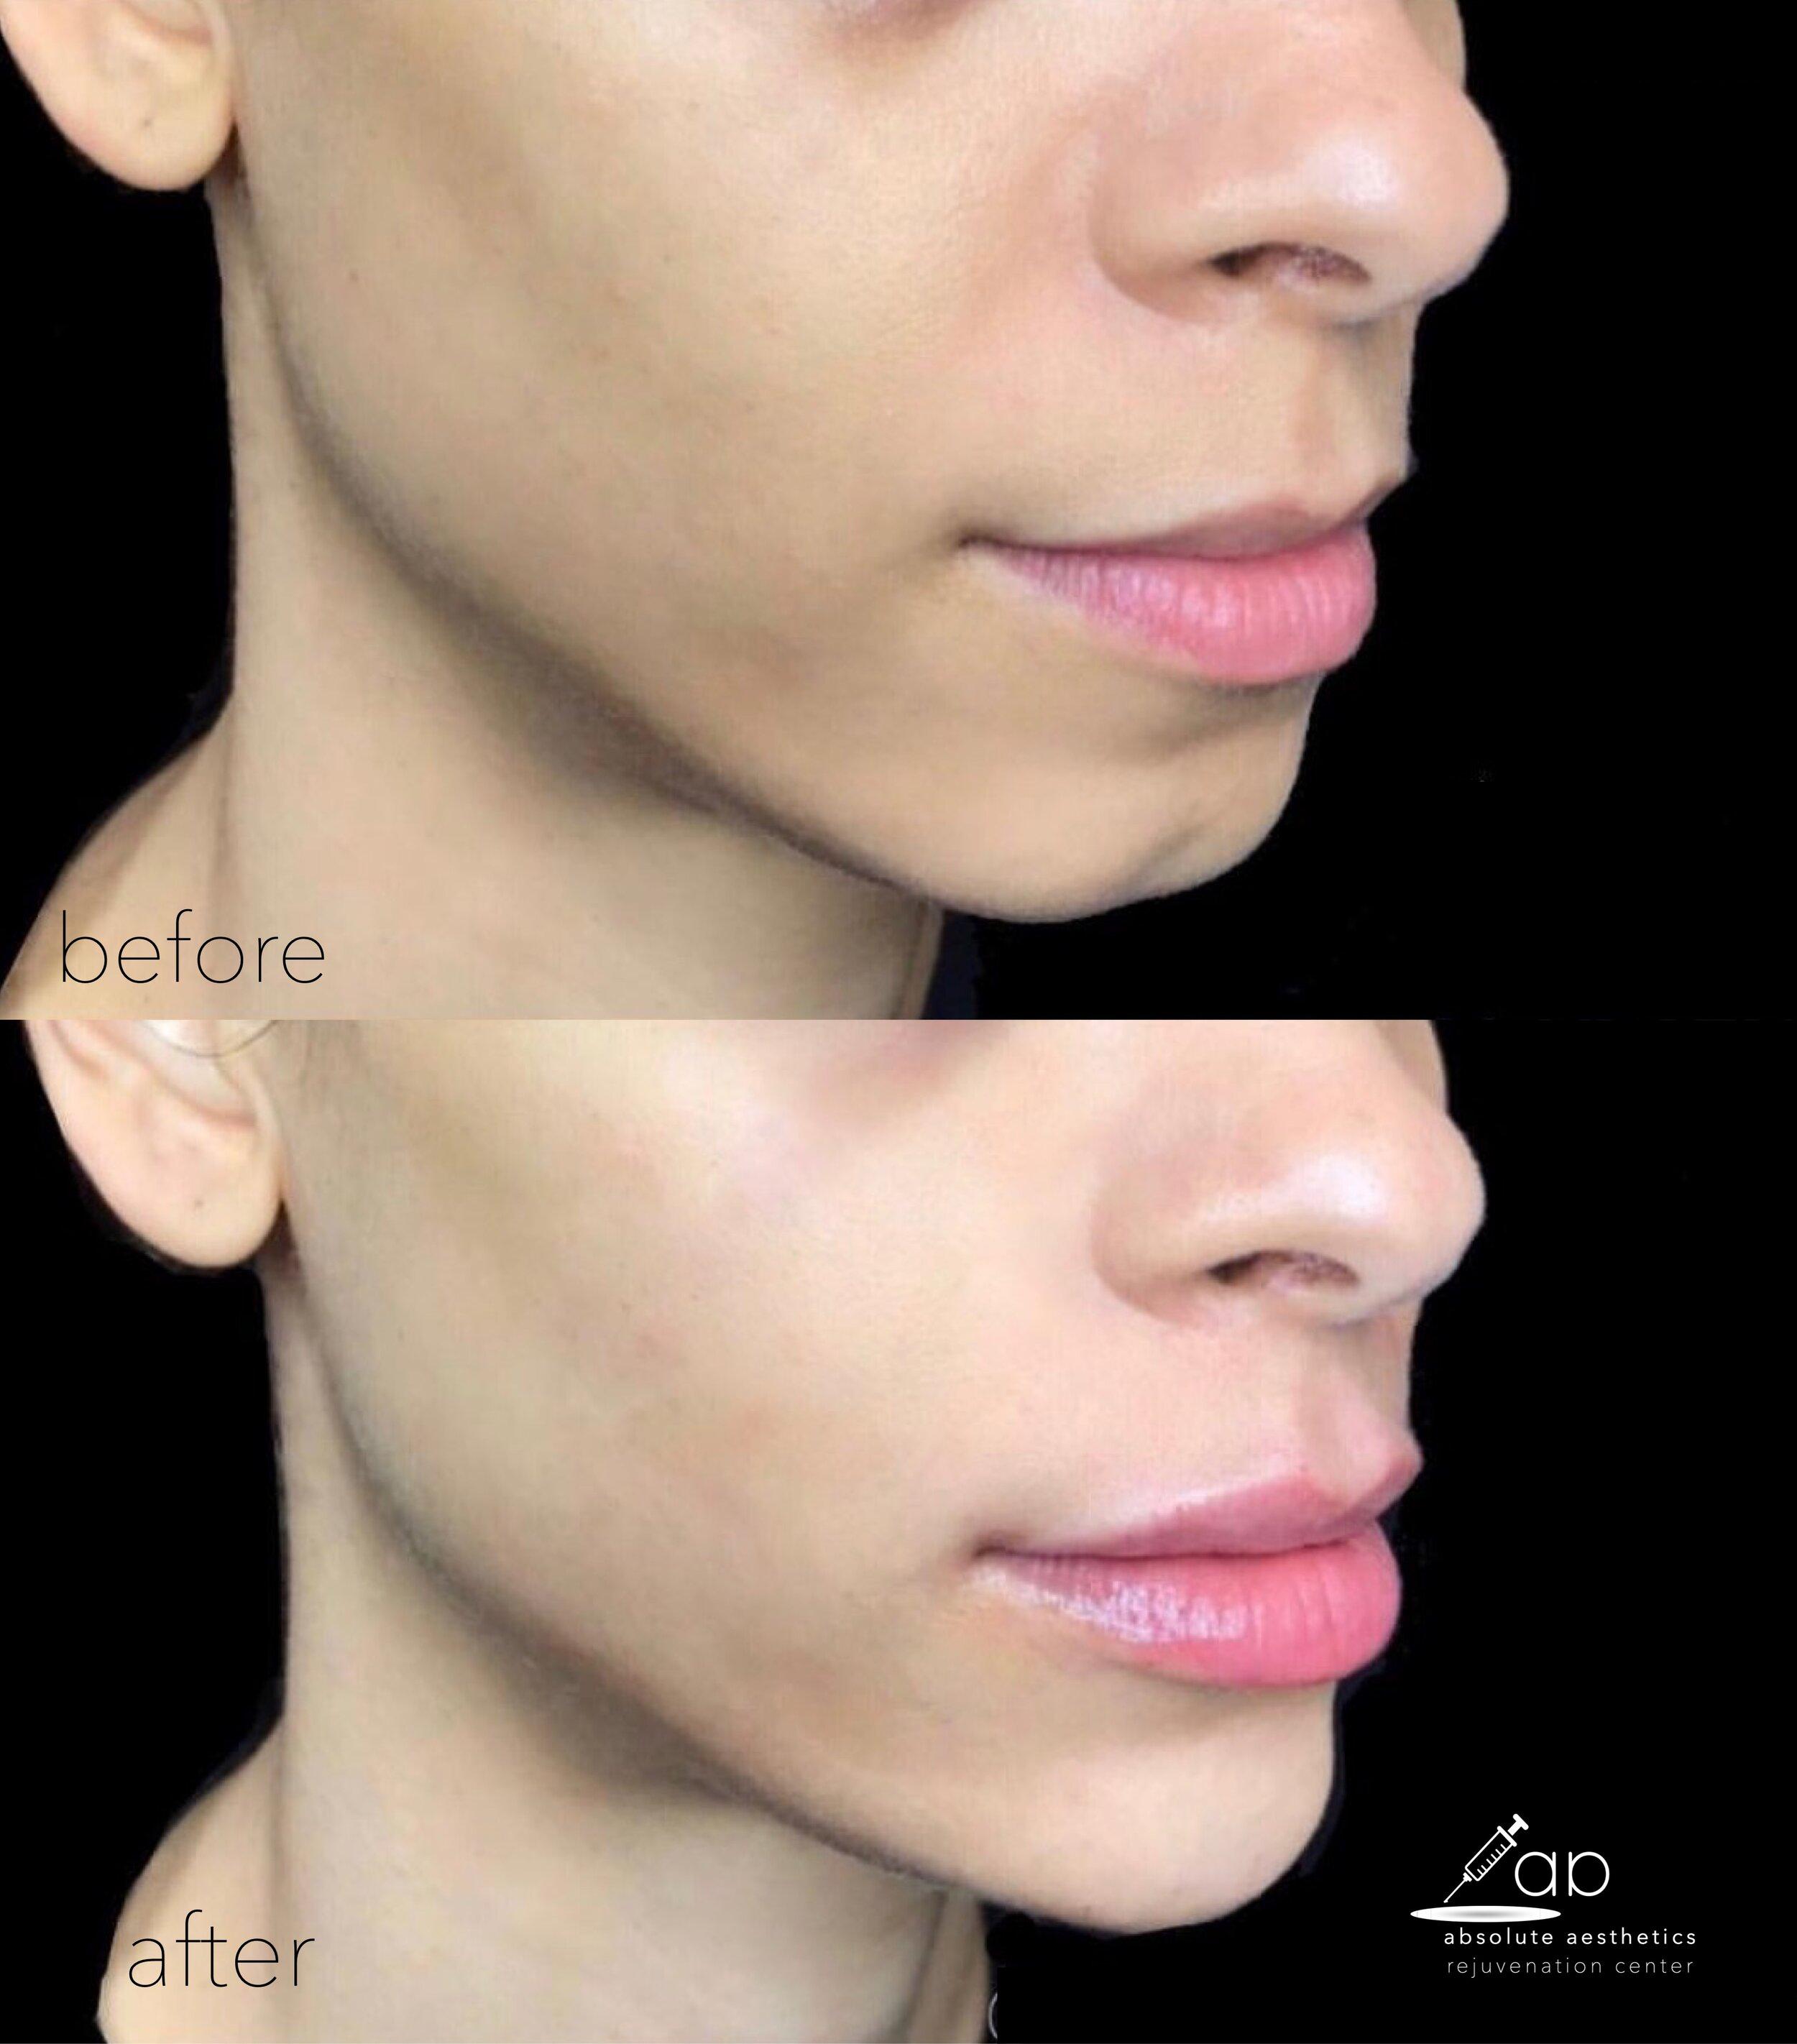 Chin and Lip Augmentation